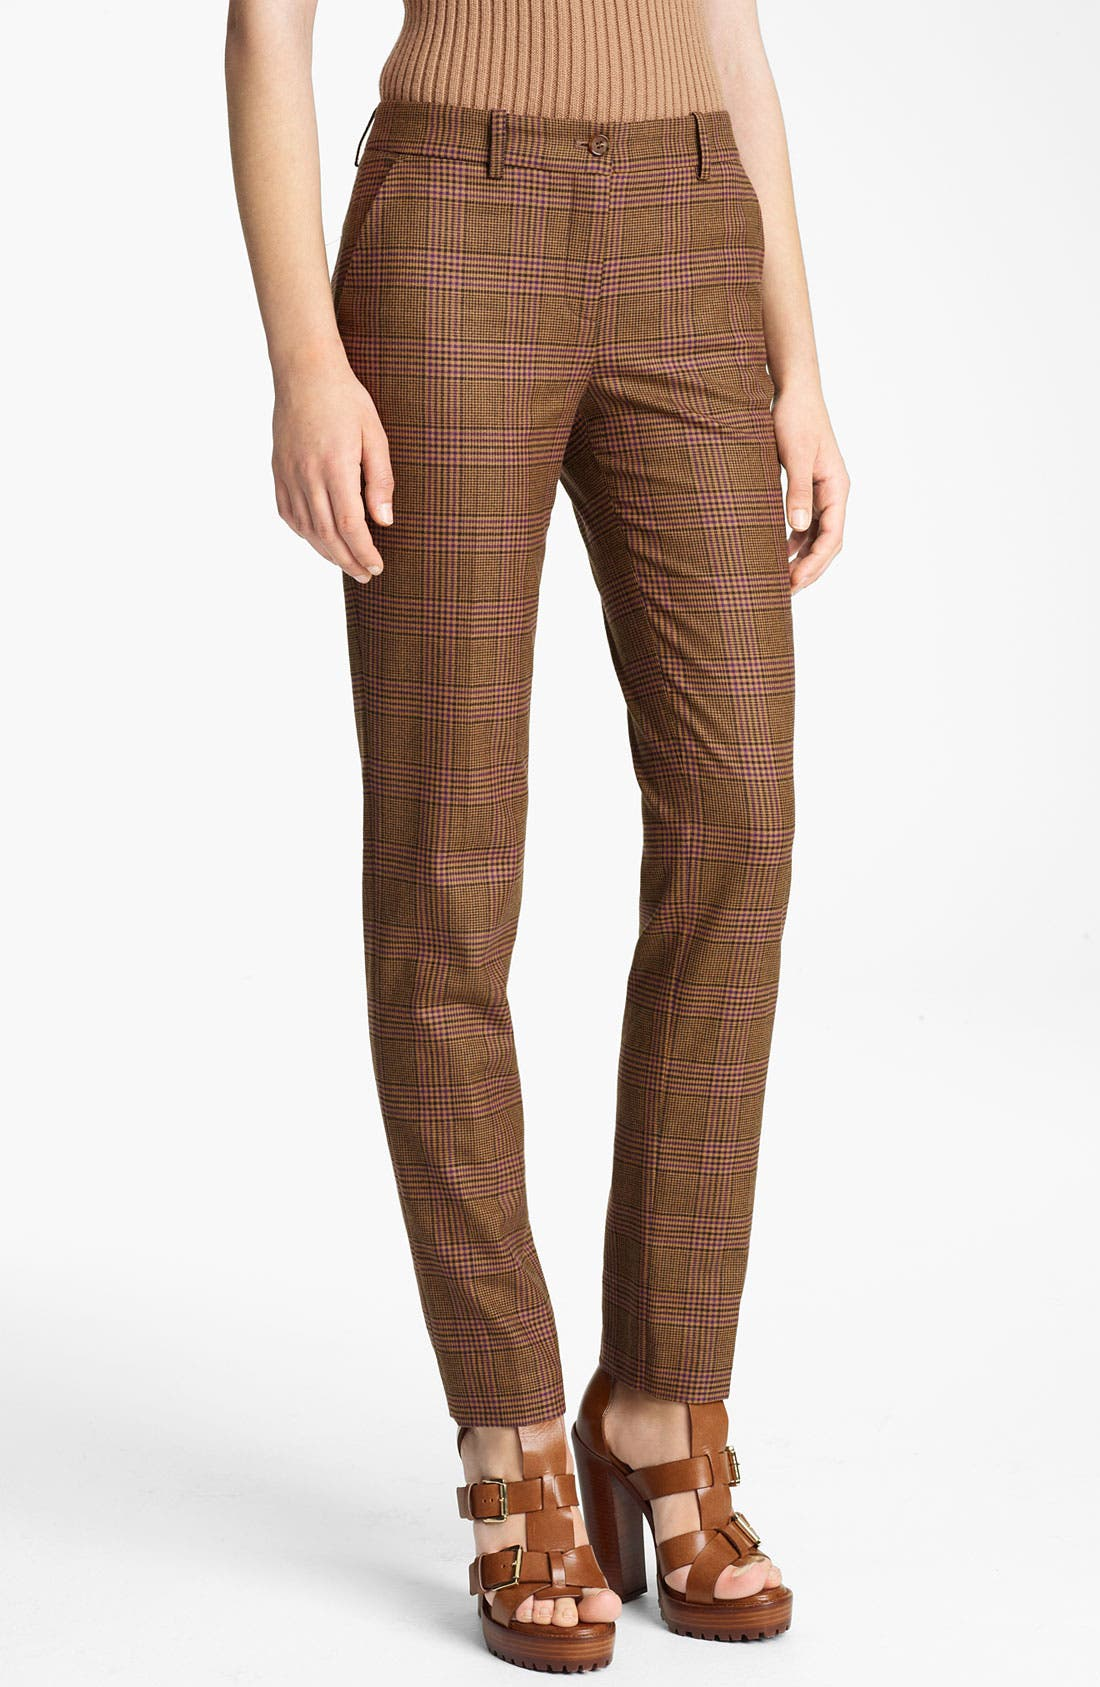 Main Image - Michael Kors 'Samantha' Skinny Plaid Wool Pants